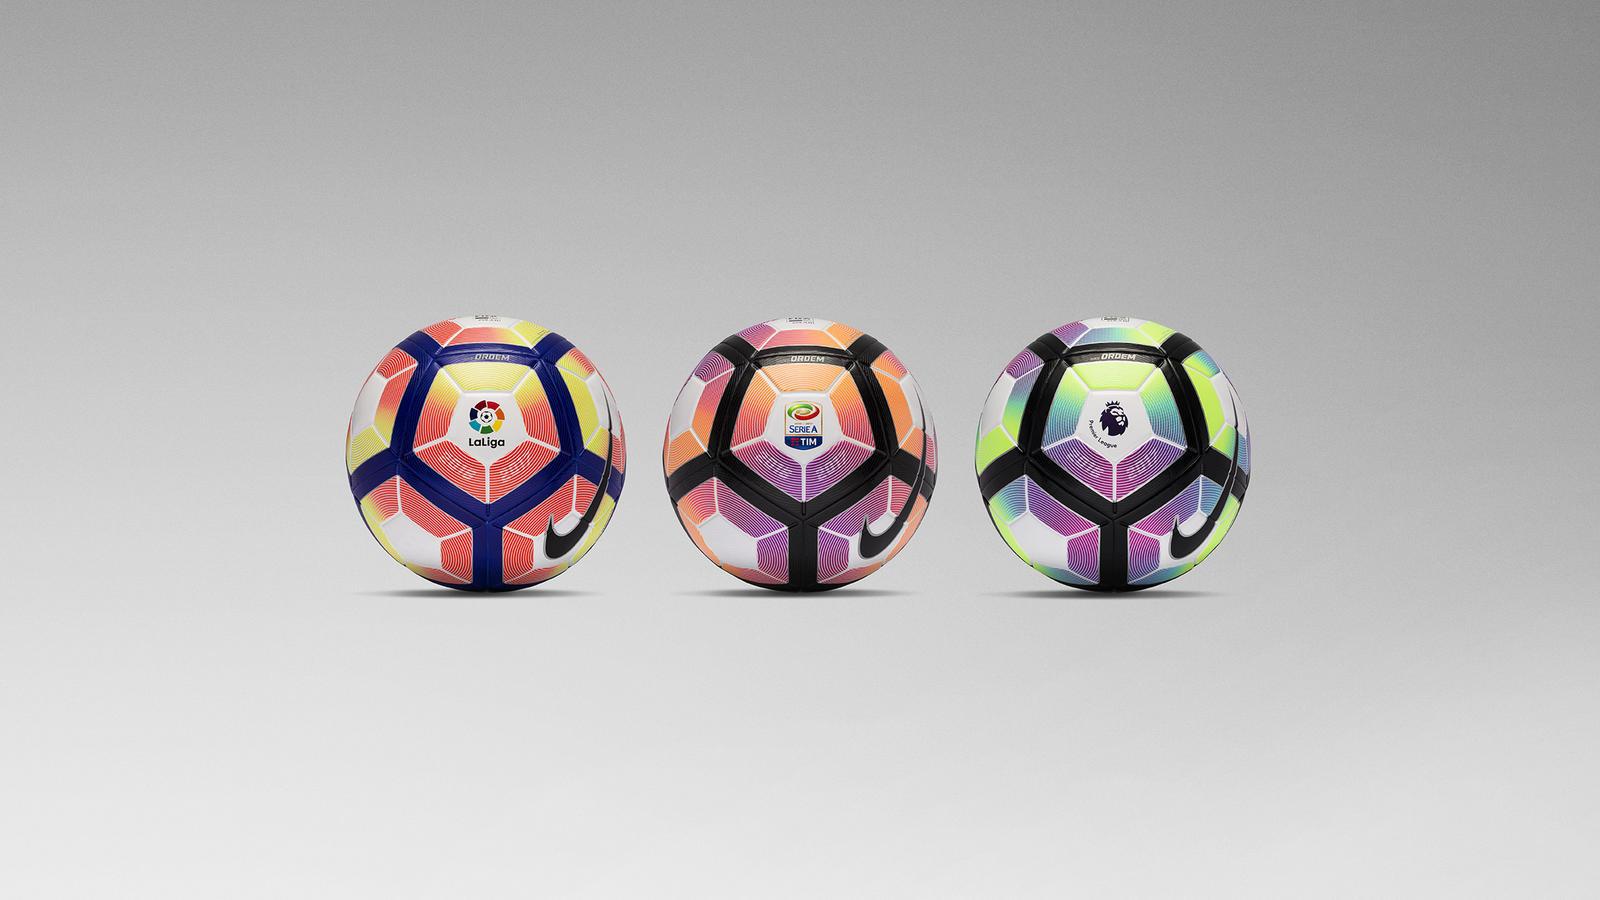 340ff0a4a ... Premier League. Fa16_FB_Ordem_Ball_Liga_LR. Ordem 4 - official ball of  La Liga. Fa16_FB_Ordem_Group